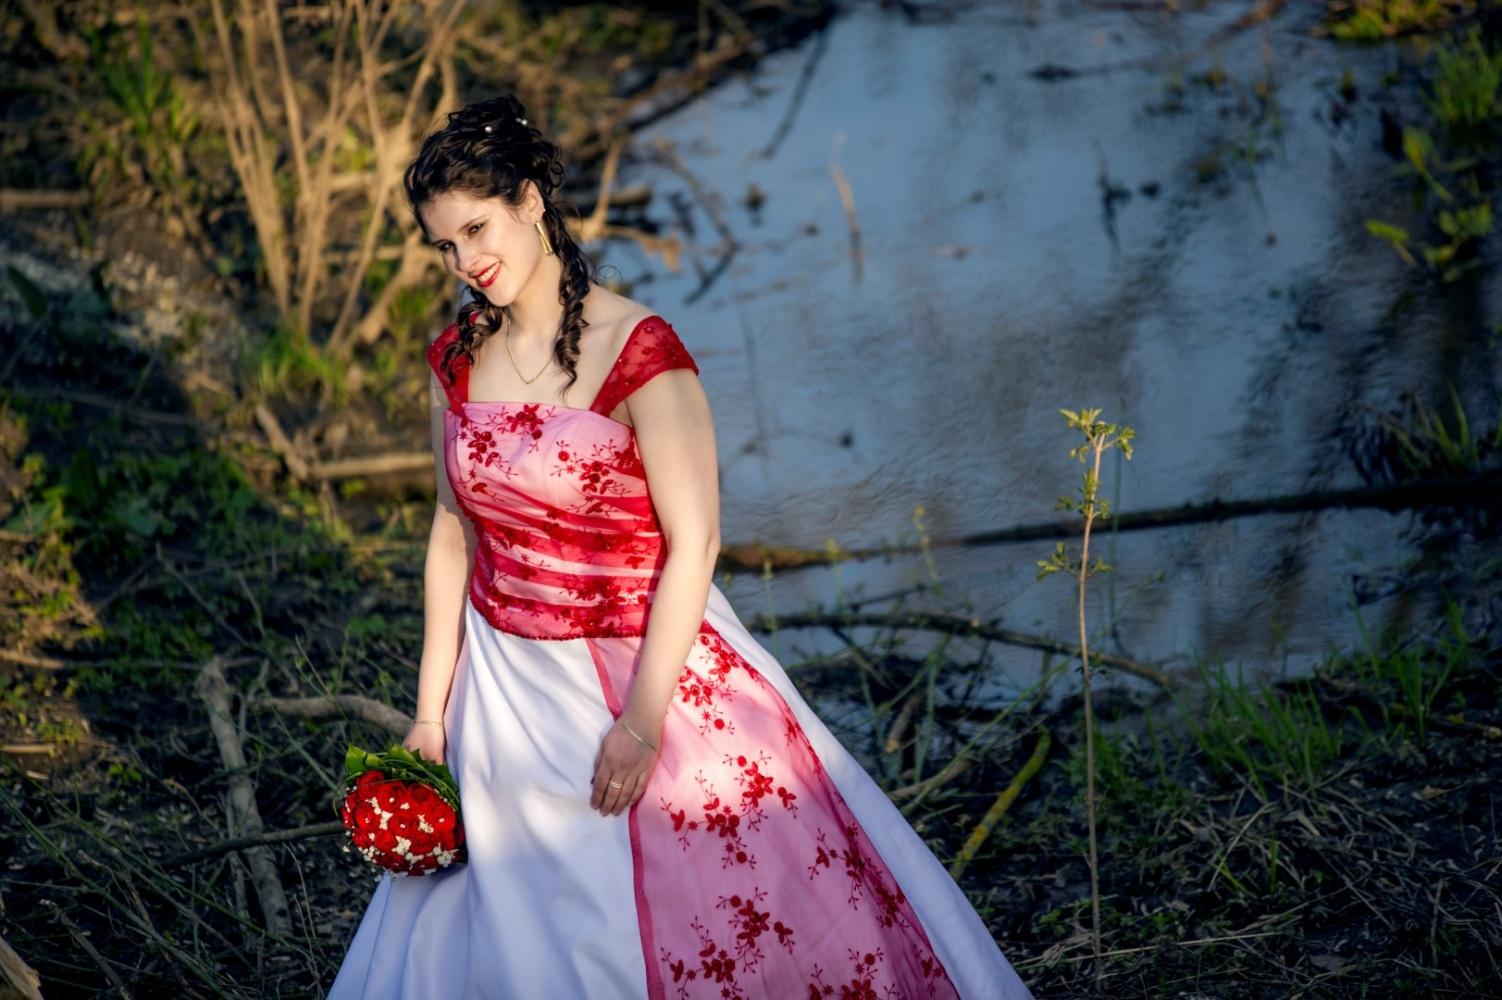 http://www.fotoz.sk/images/gallery-39/normal/svadobny-fotograf_eskuvoi-fotos_lacny-fotograf_fotograf-na-svadbu_juraj-zsok_fotograf-nitra_fotograf-galanta_juraj-zsok200.jpg